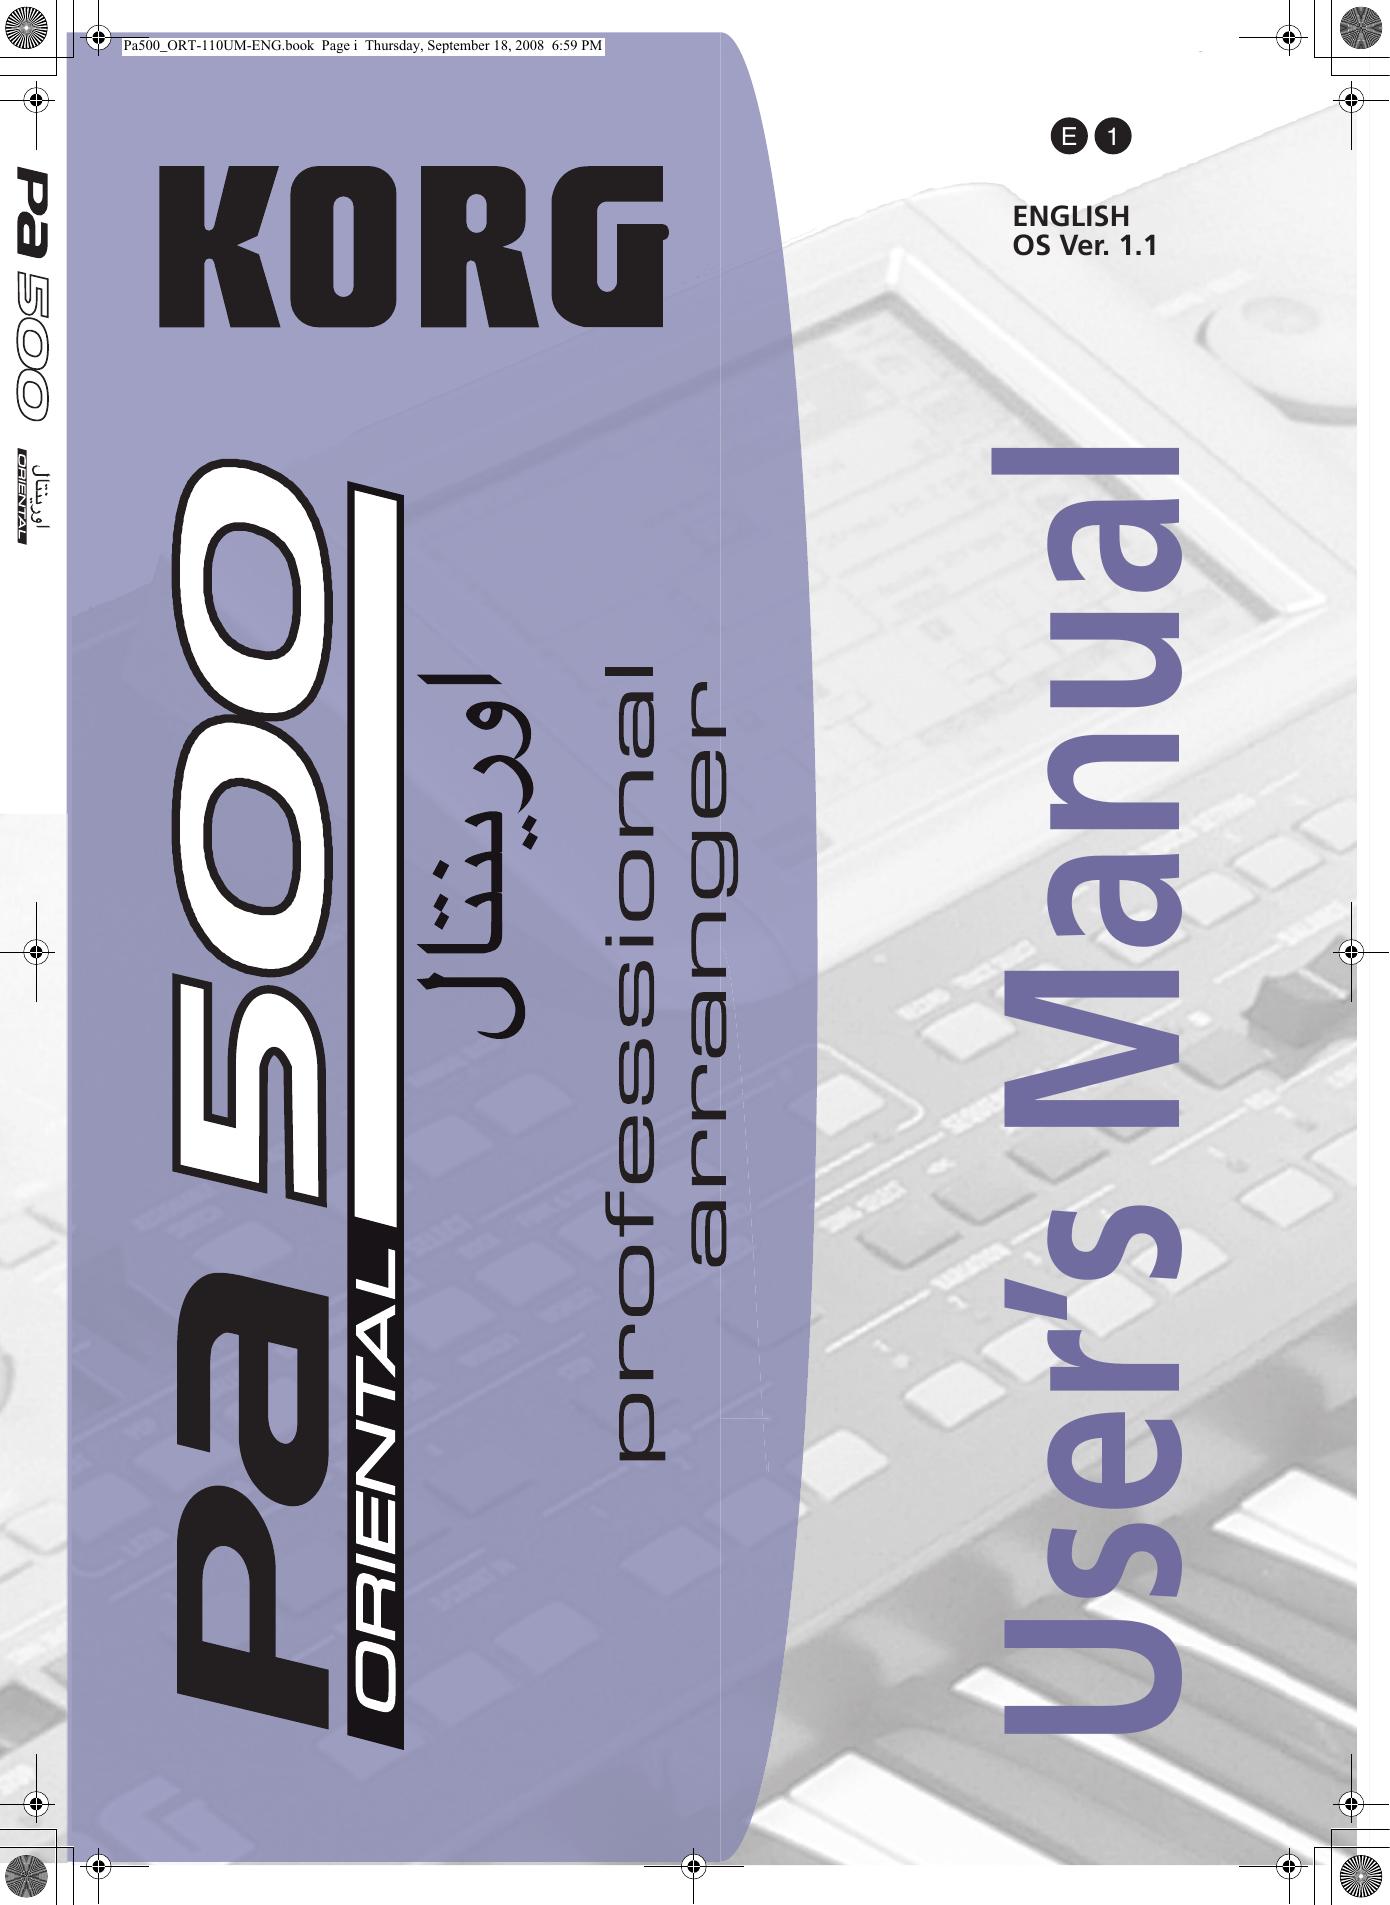 KORG Pa500 Oriental 1 17 User's Manual (E1)   manualzz com